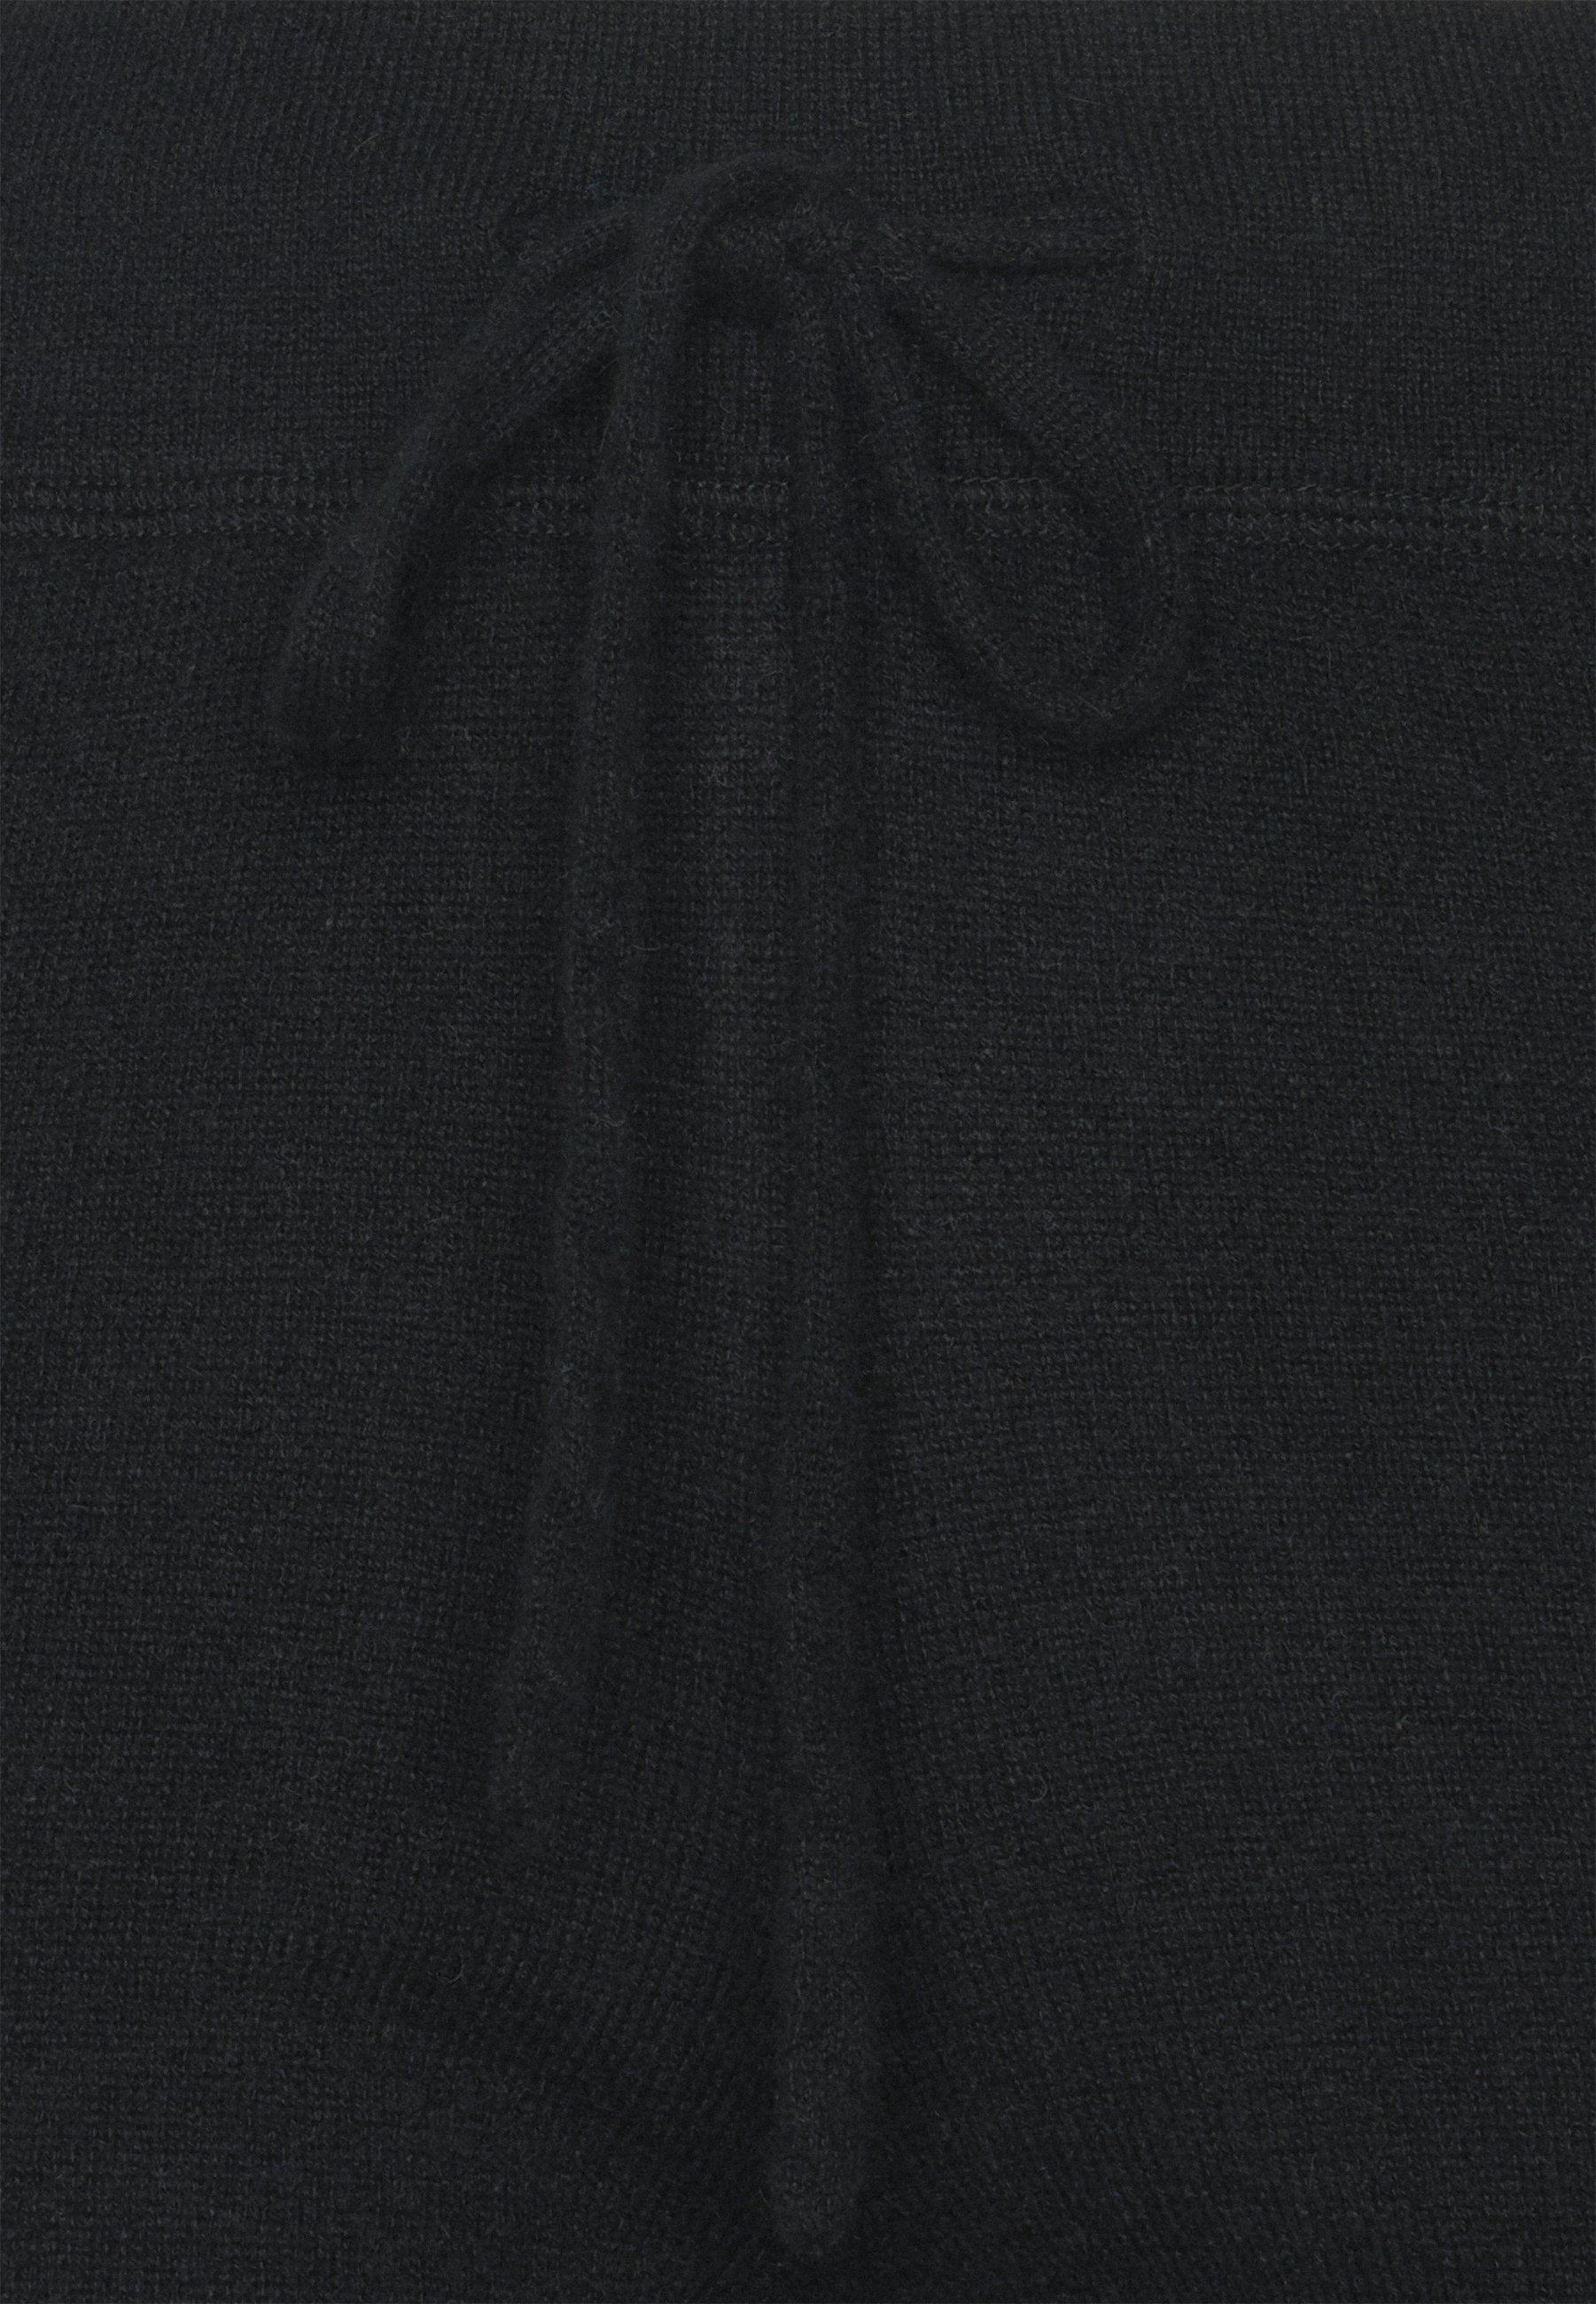 Best Place Low Cost Women's Clothing Davida Cashmere PANTS Trousers black jN9xpYEYn 0xXzRWVut